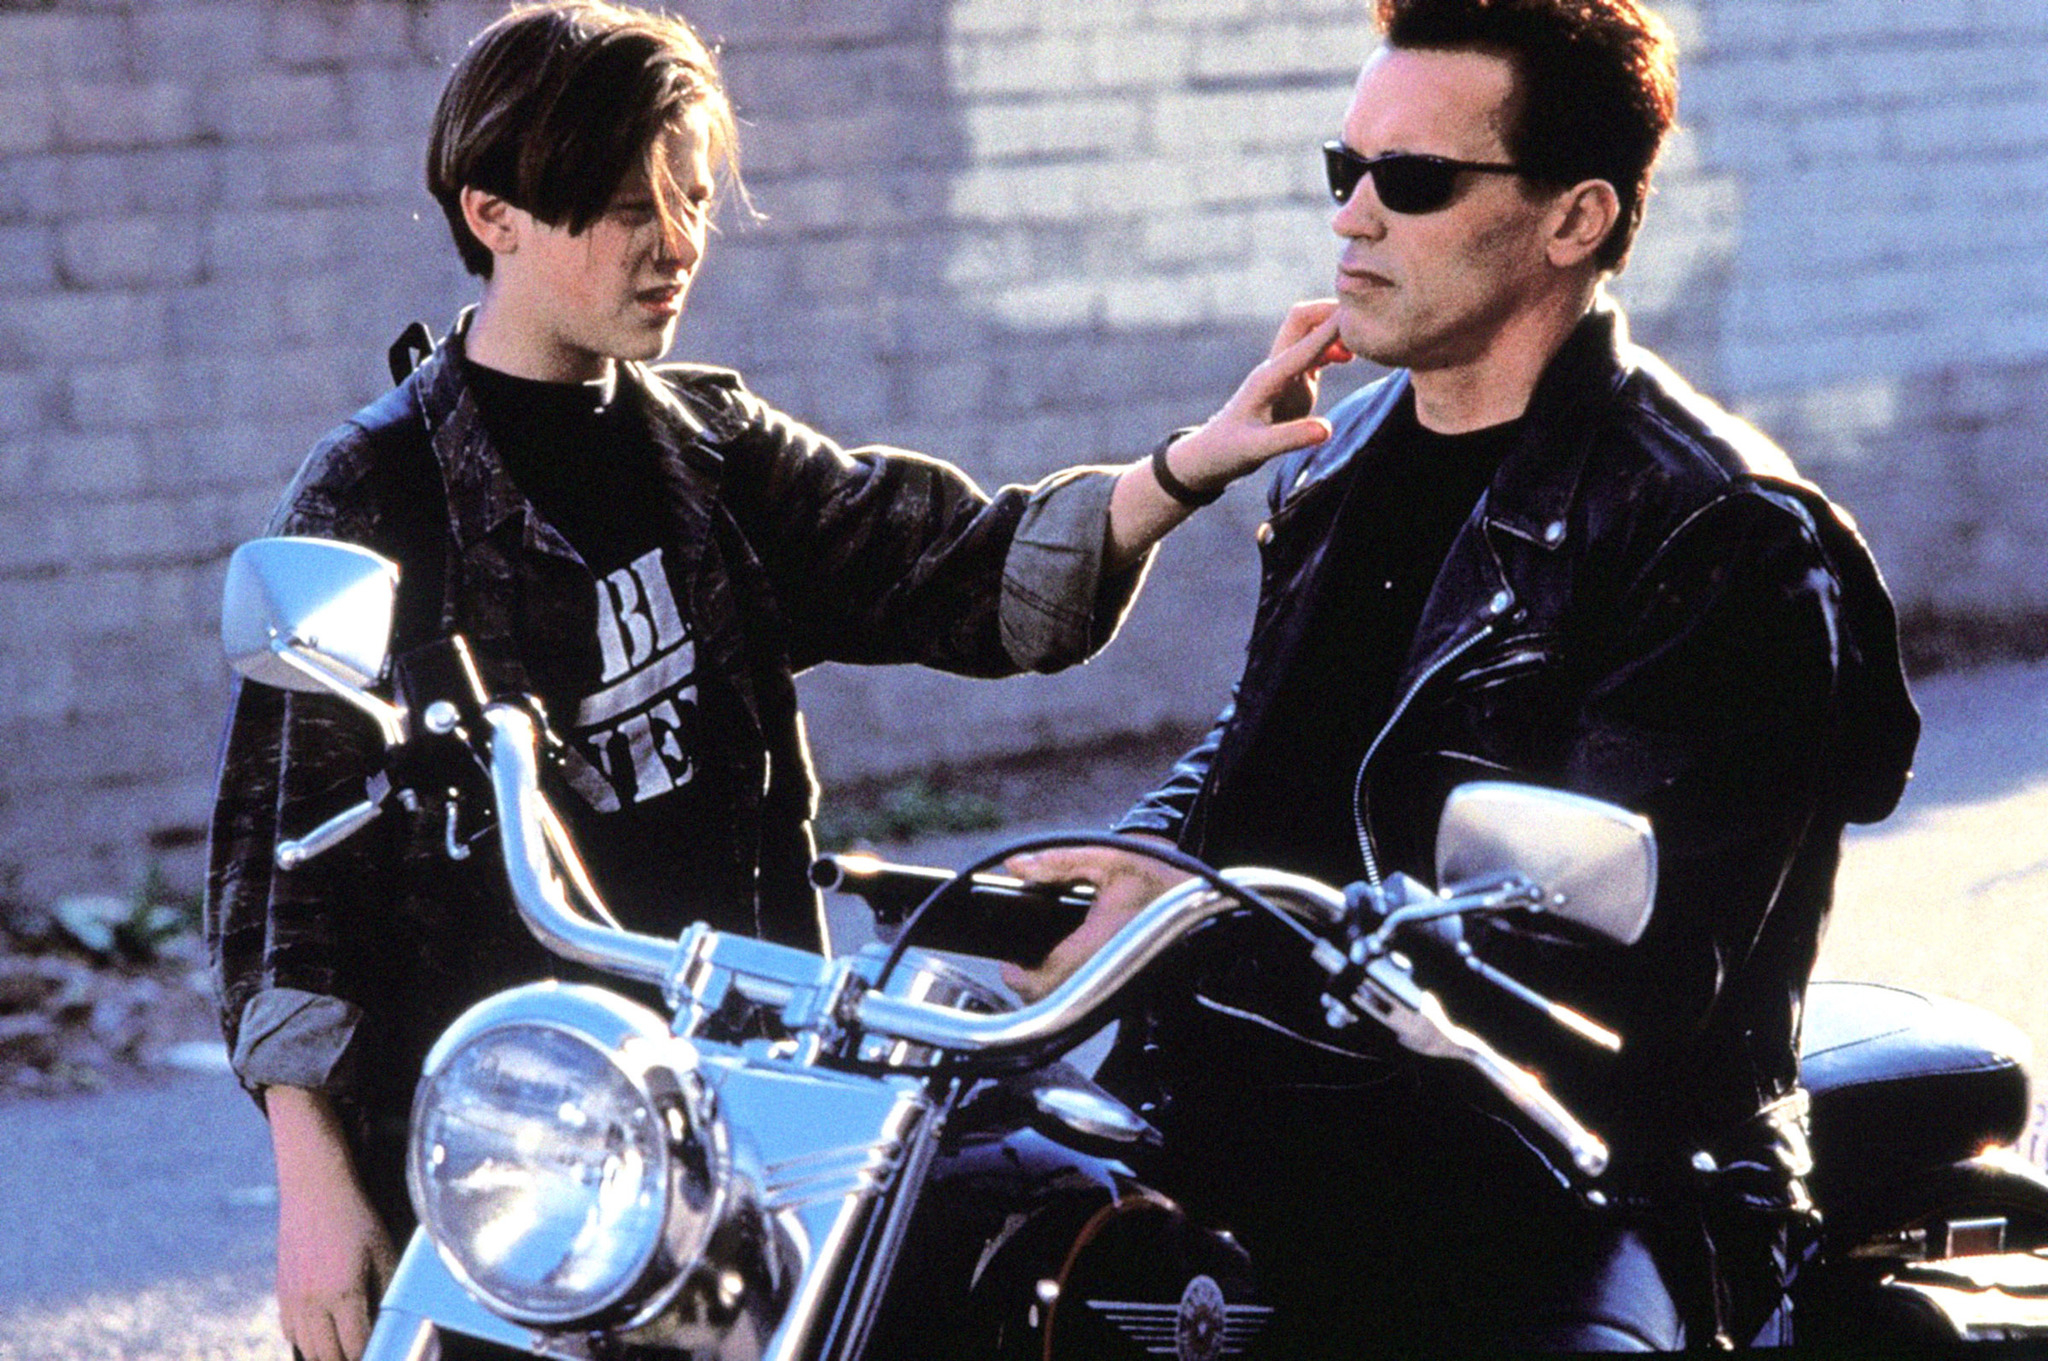 Terminator 2 judgment day hd wallpaper background image 2048x1361 id 633669 wallpaper abyss - Terminator 2 wallpaper hd ...